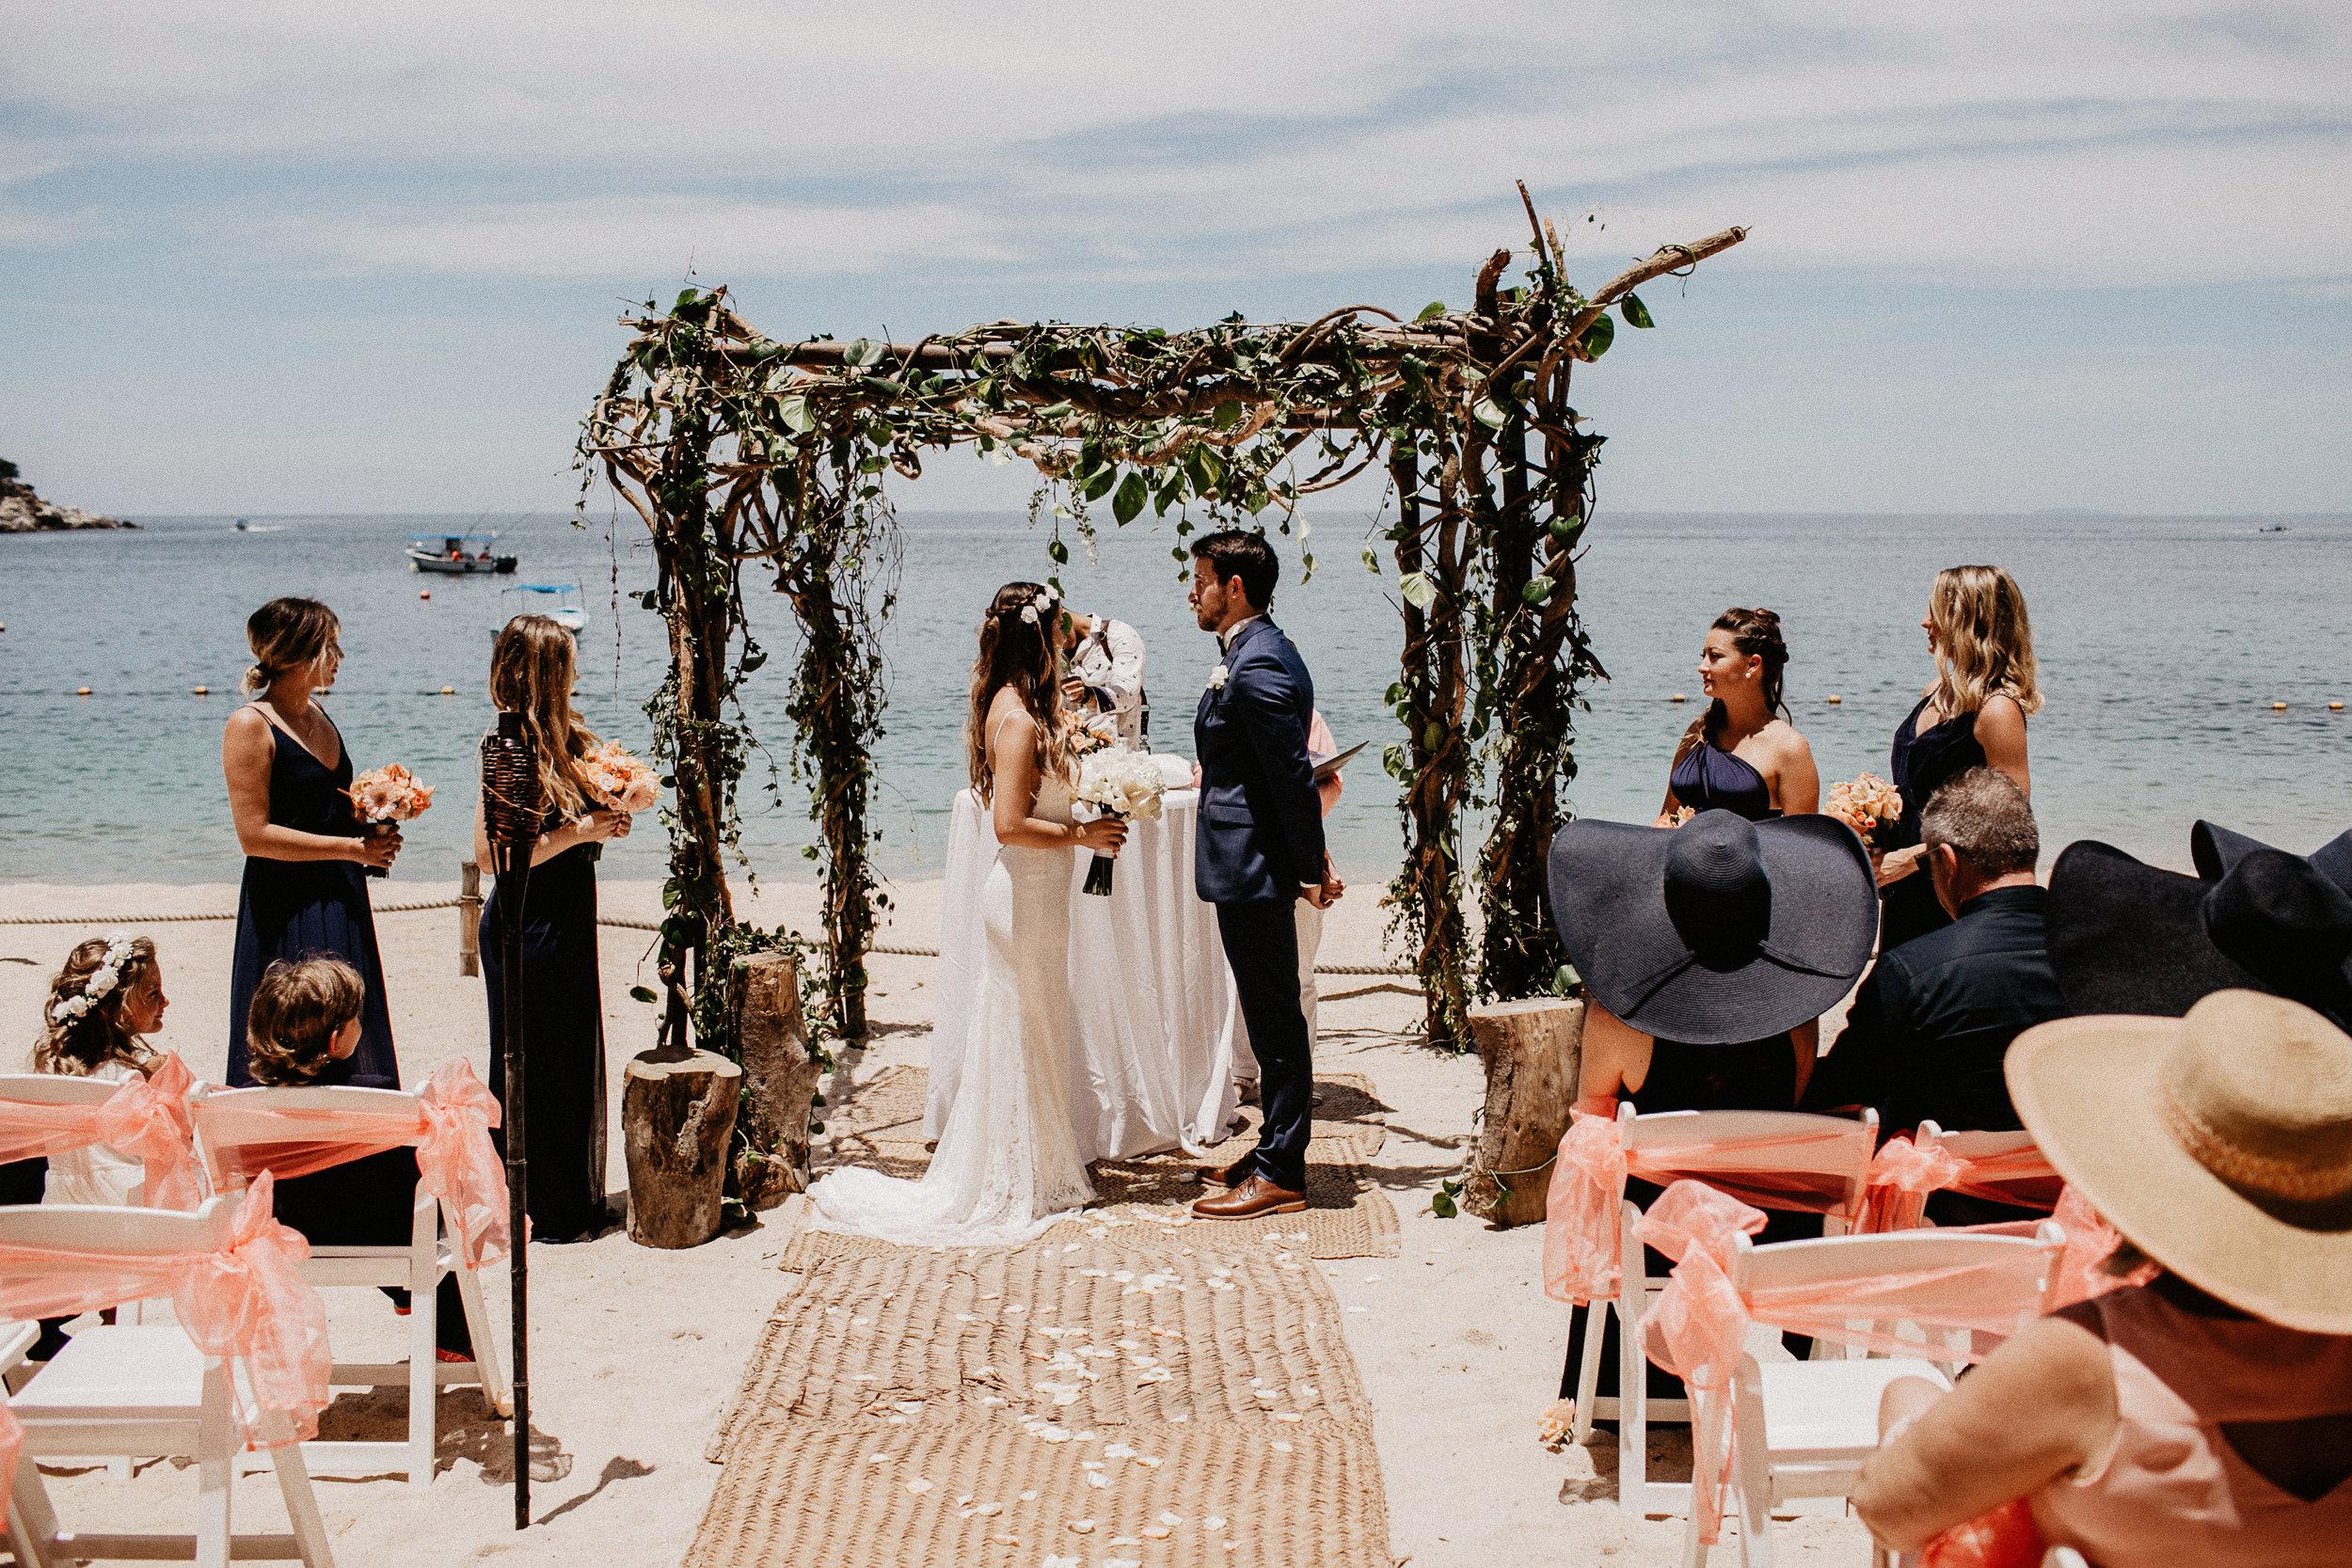 alfonso_flores_destination_wedding_photography_puerto_vallarta_hotel_barcelo_vallarta_cuttler_amela-221.JPG